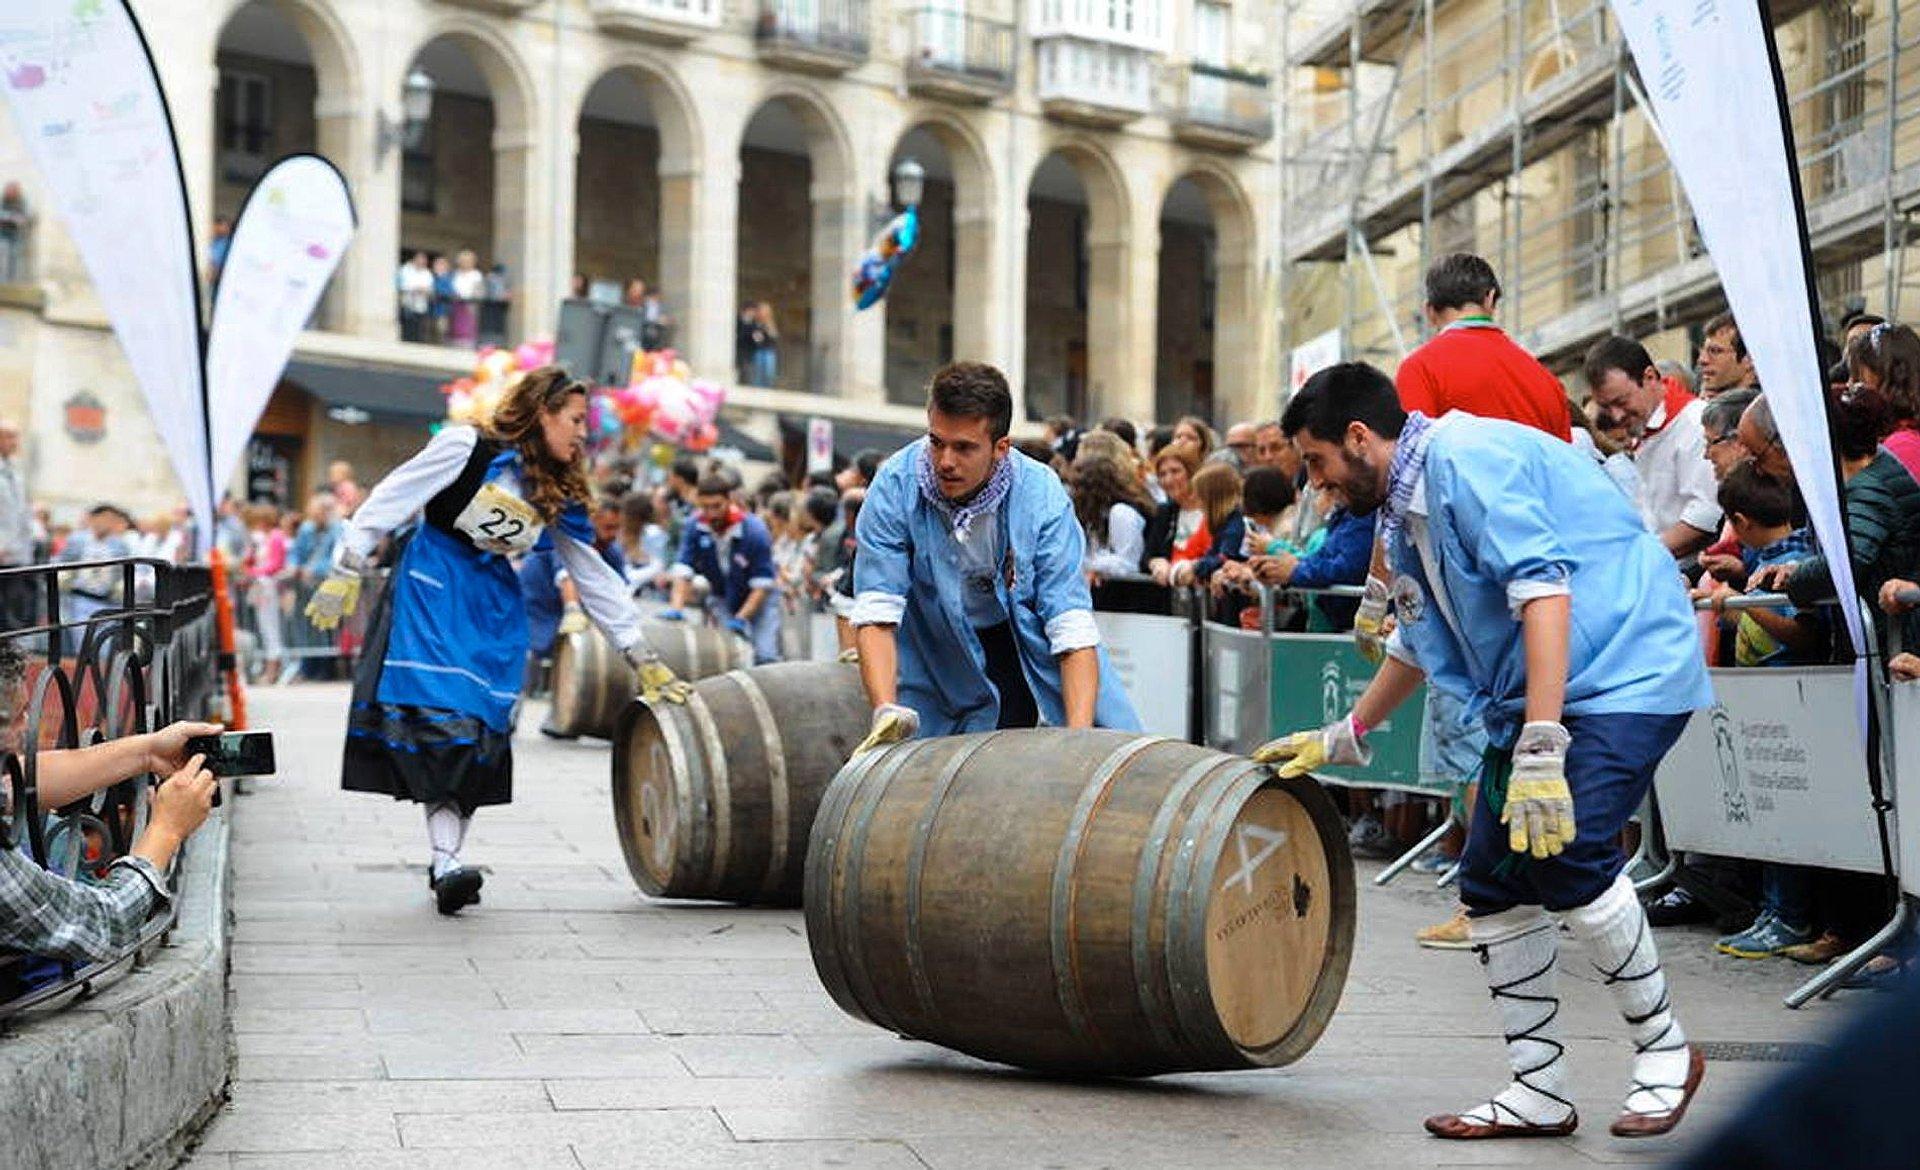 Best time for Fiestas de La Blanca & Celedón, Vitoria-Gasteiz in Basque Country 2019